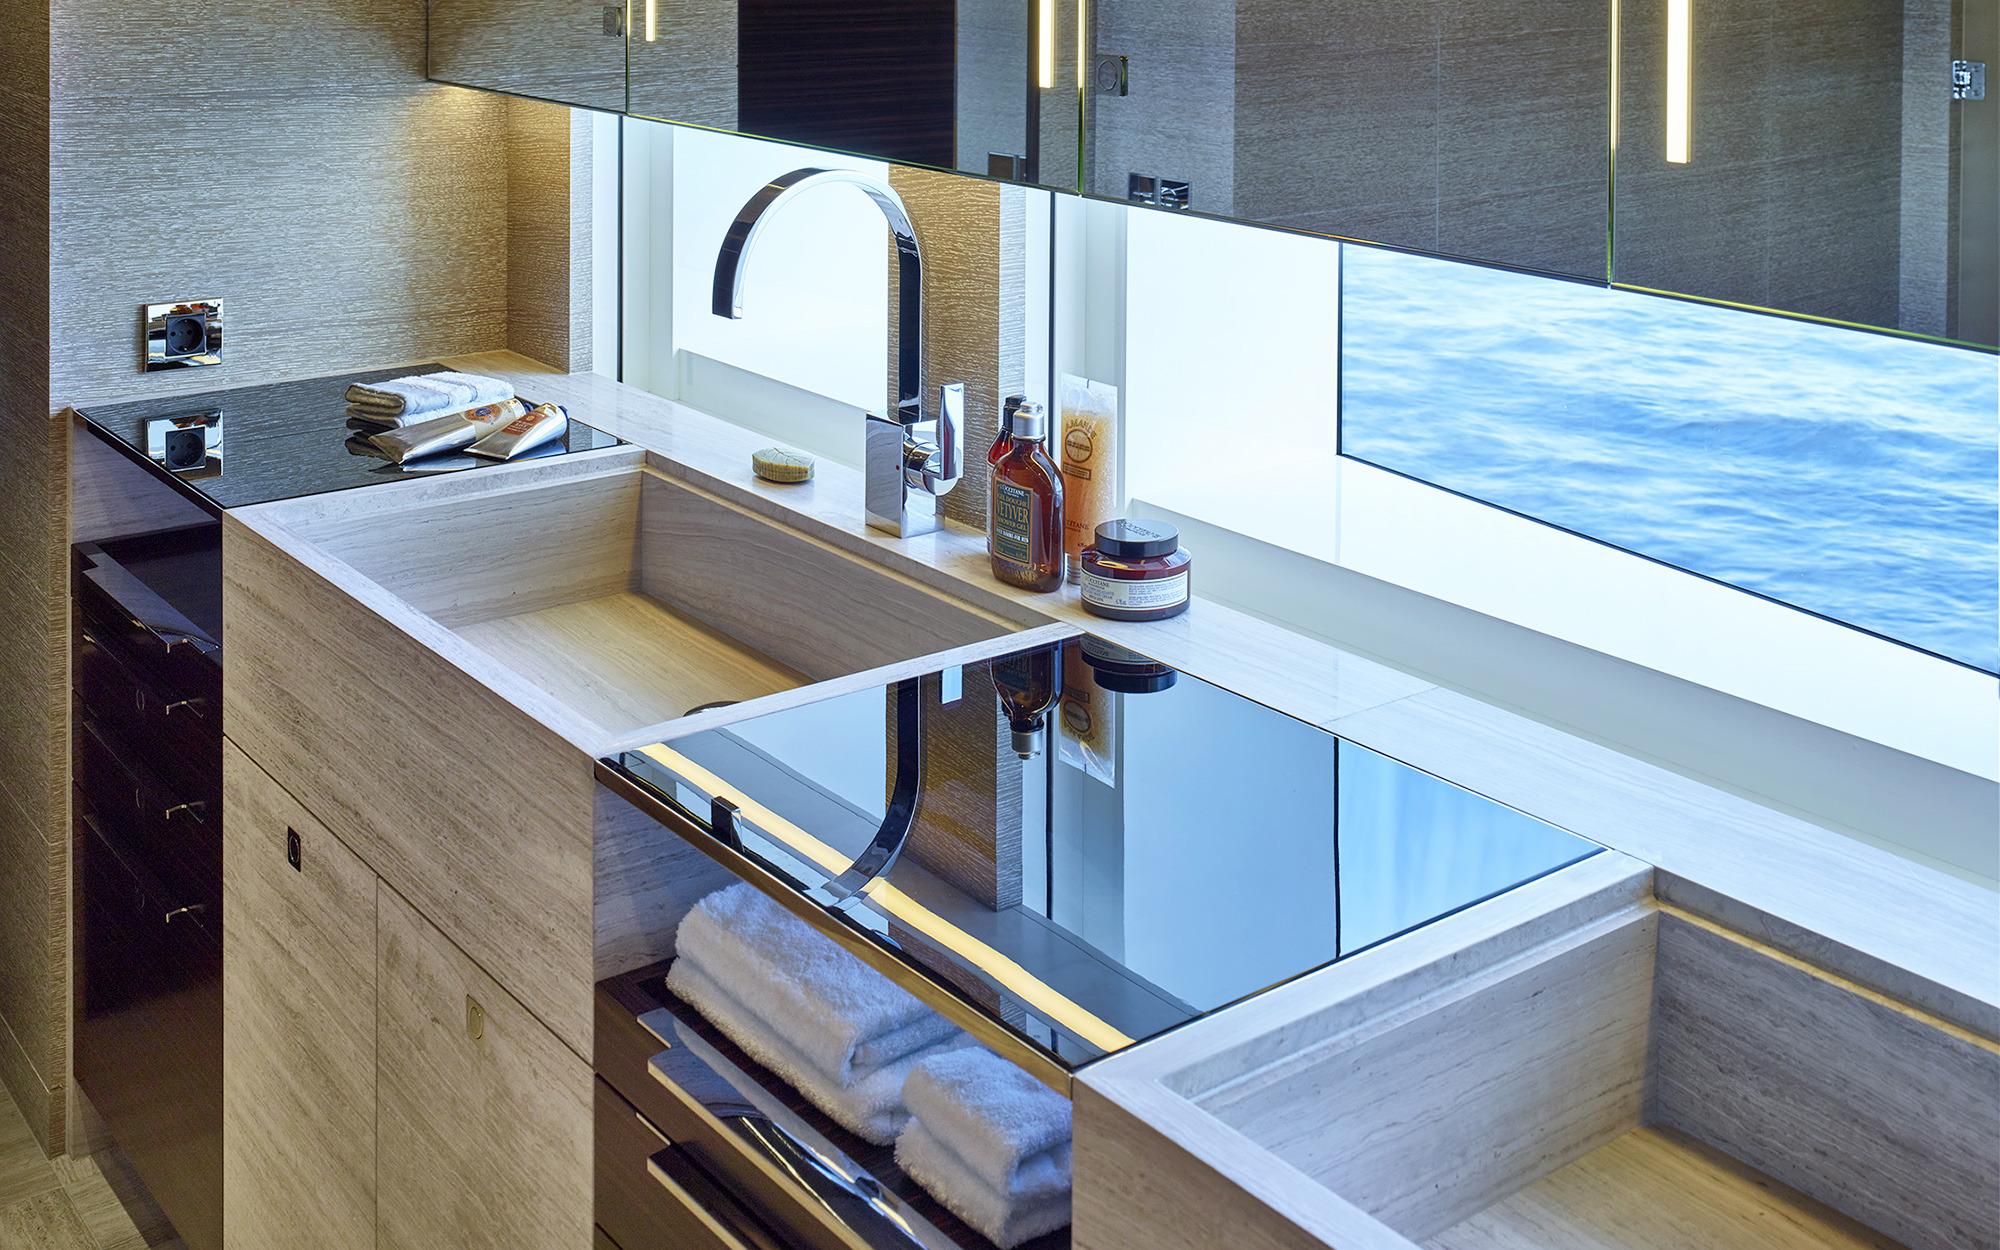 Bathroom Image Gallery - Bathroom - Bathroom – Luxury Yacht Browser ...